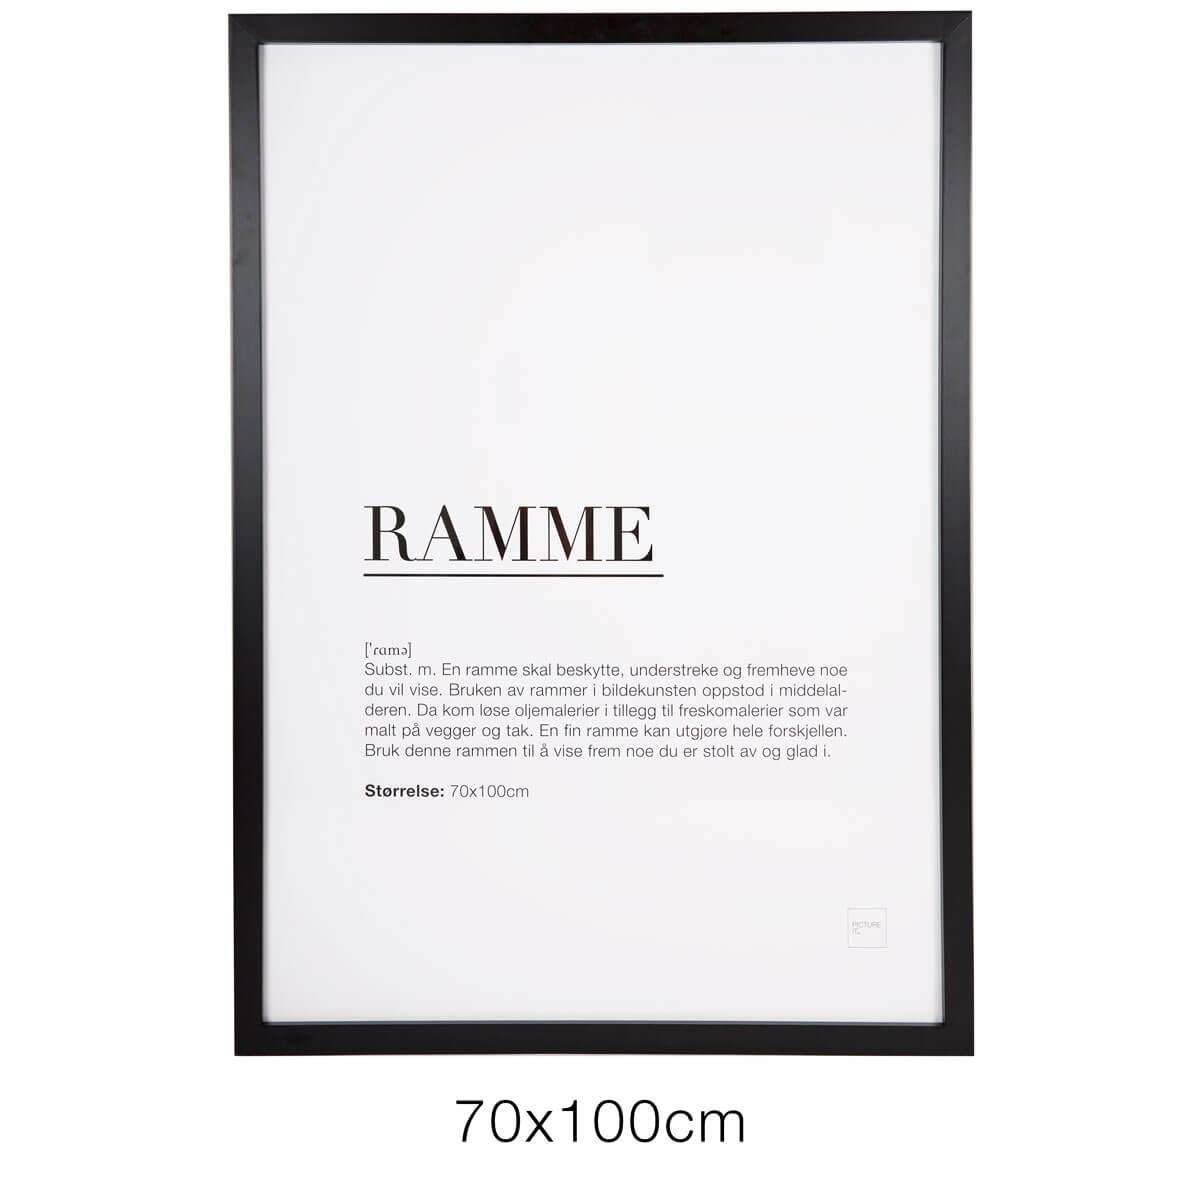 Ramme 70x100cm